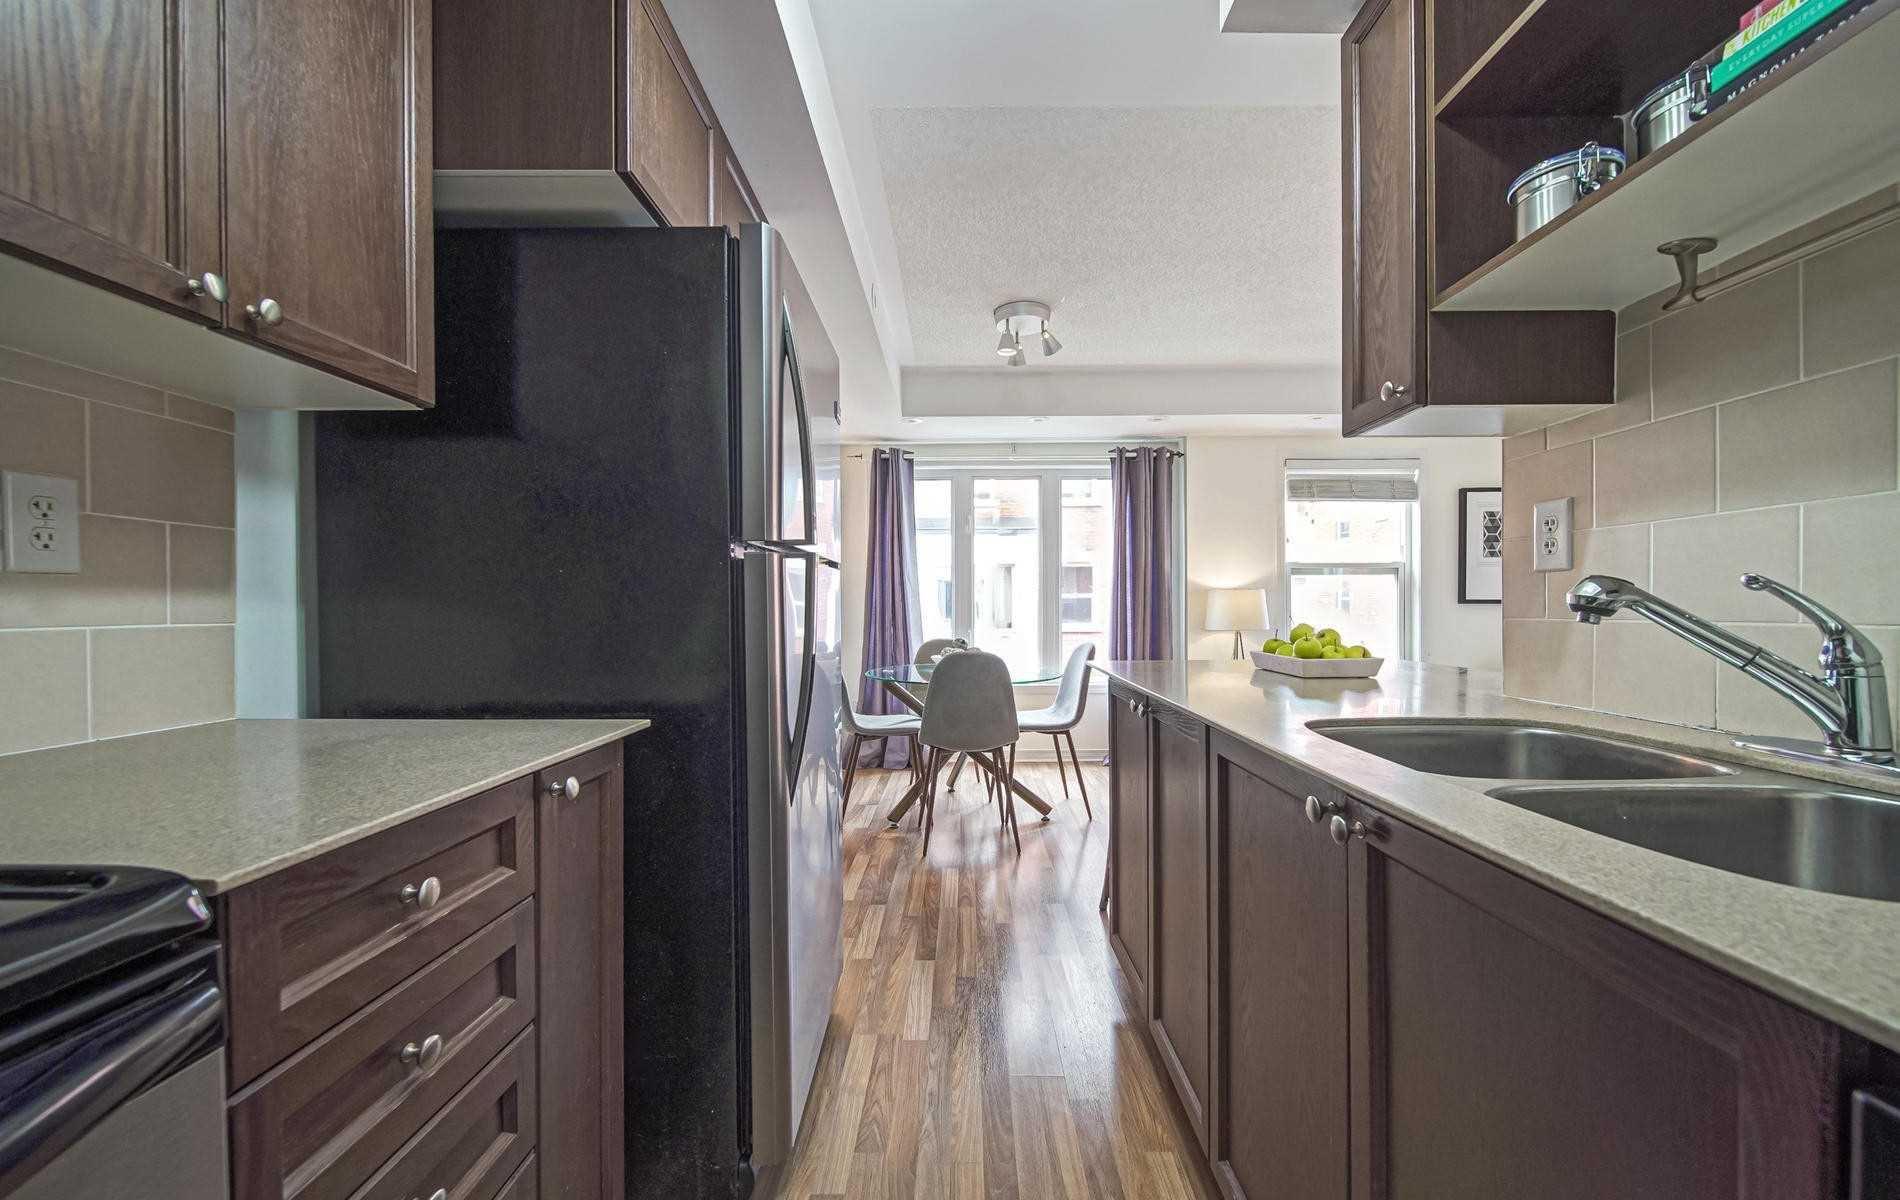 Photo 8: Photos: 3 78 Munro Street in Toronto: South Riverdale Condo for sale (Toronto E01)  : MLS®# E4615987